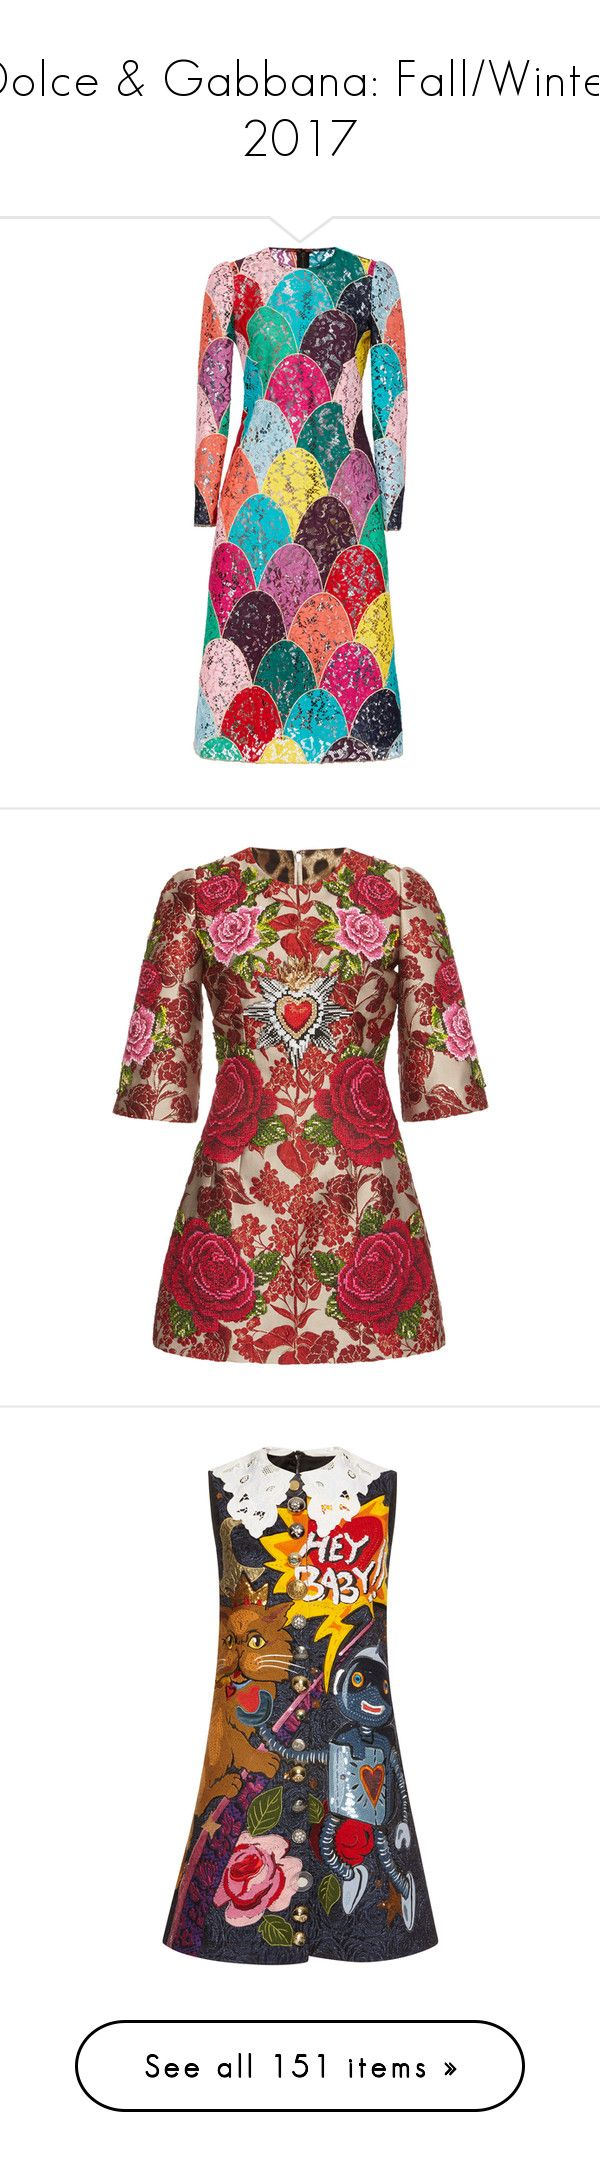 """Dolce & Gabbana: Fall/Winter 2017"" by jckyleeah ❤ liked on Polyvore featuring dolcegabbana, fallwinter2017, jckyleeahfw17, dresses, multi, long sleeve crew neck dress, multi color dress, multi-color dresses, crew neck dress and lacy dress"